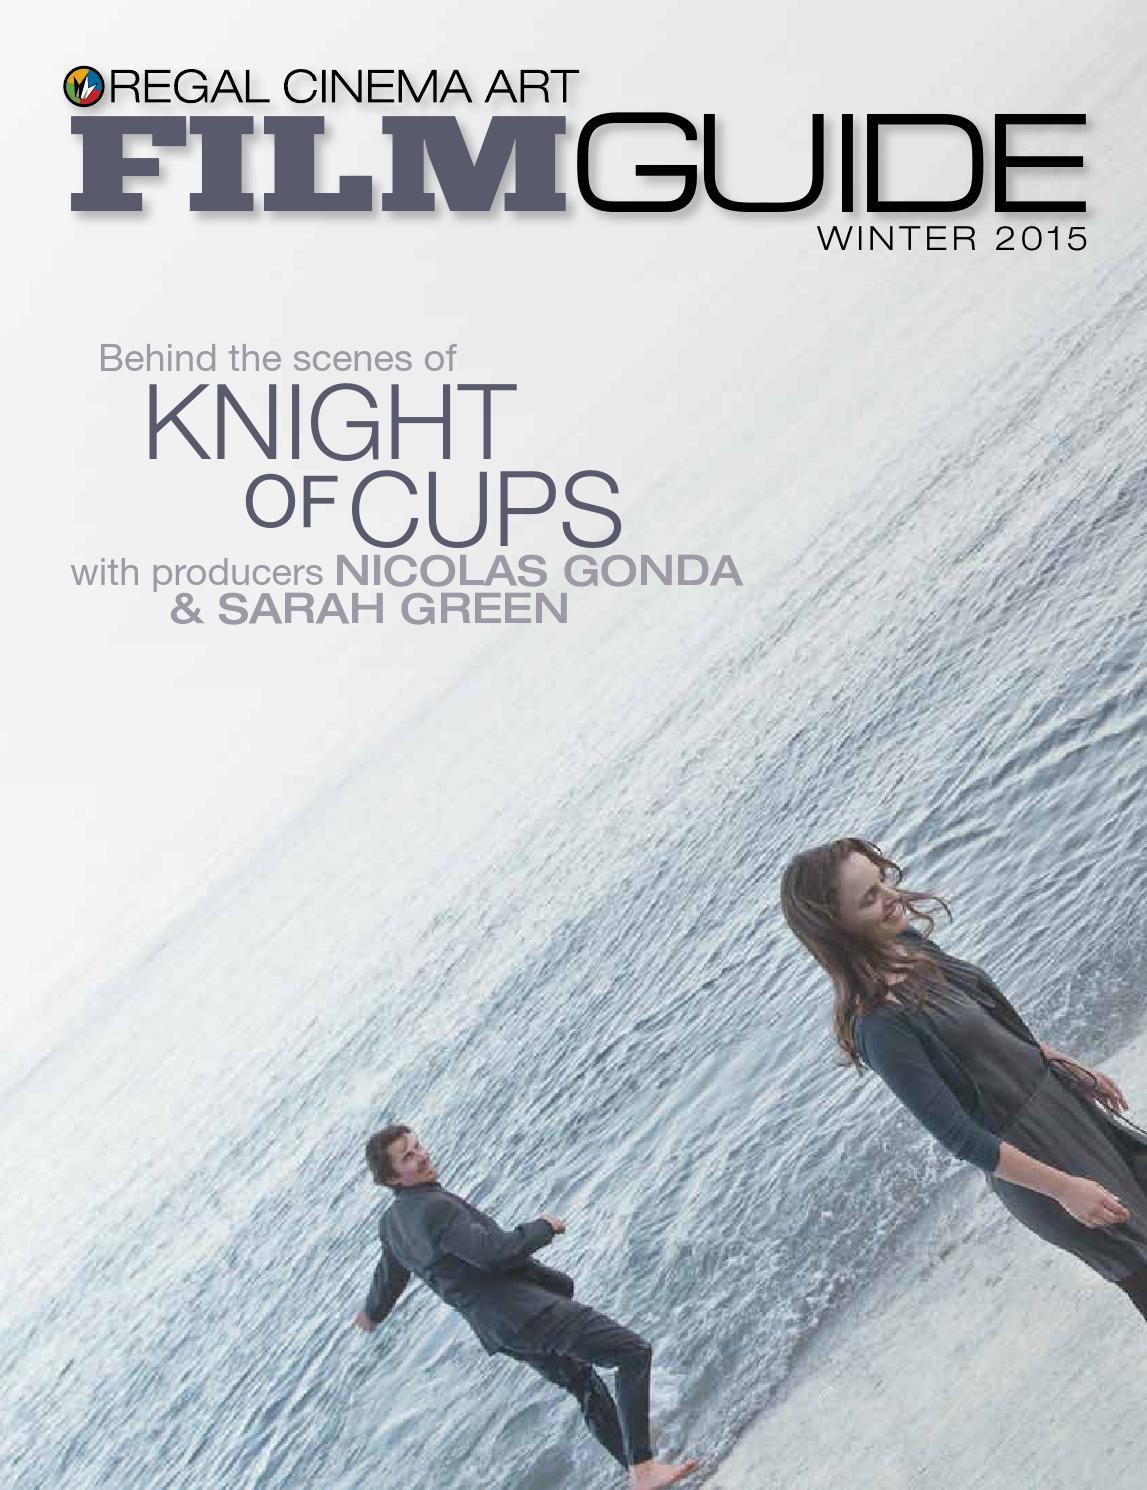 regal cinema art film guide fall 2016 by regal entertainment regal cinema art film guide winter 2015